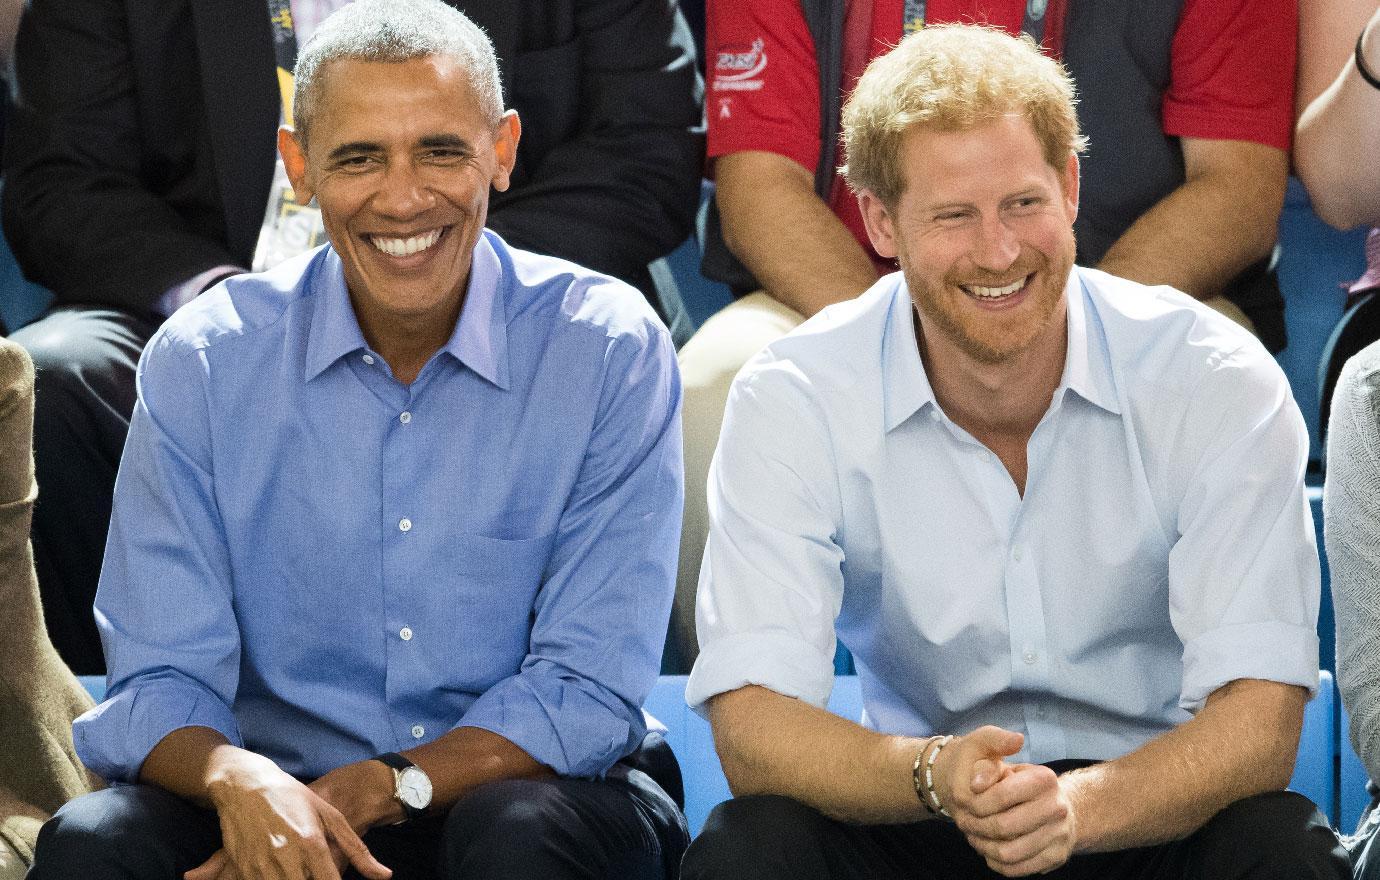 prince harry bromance with barack obama